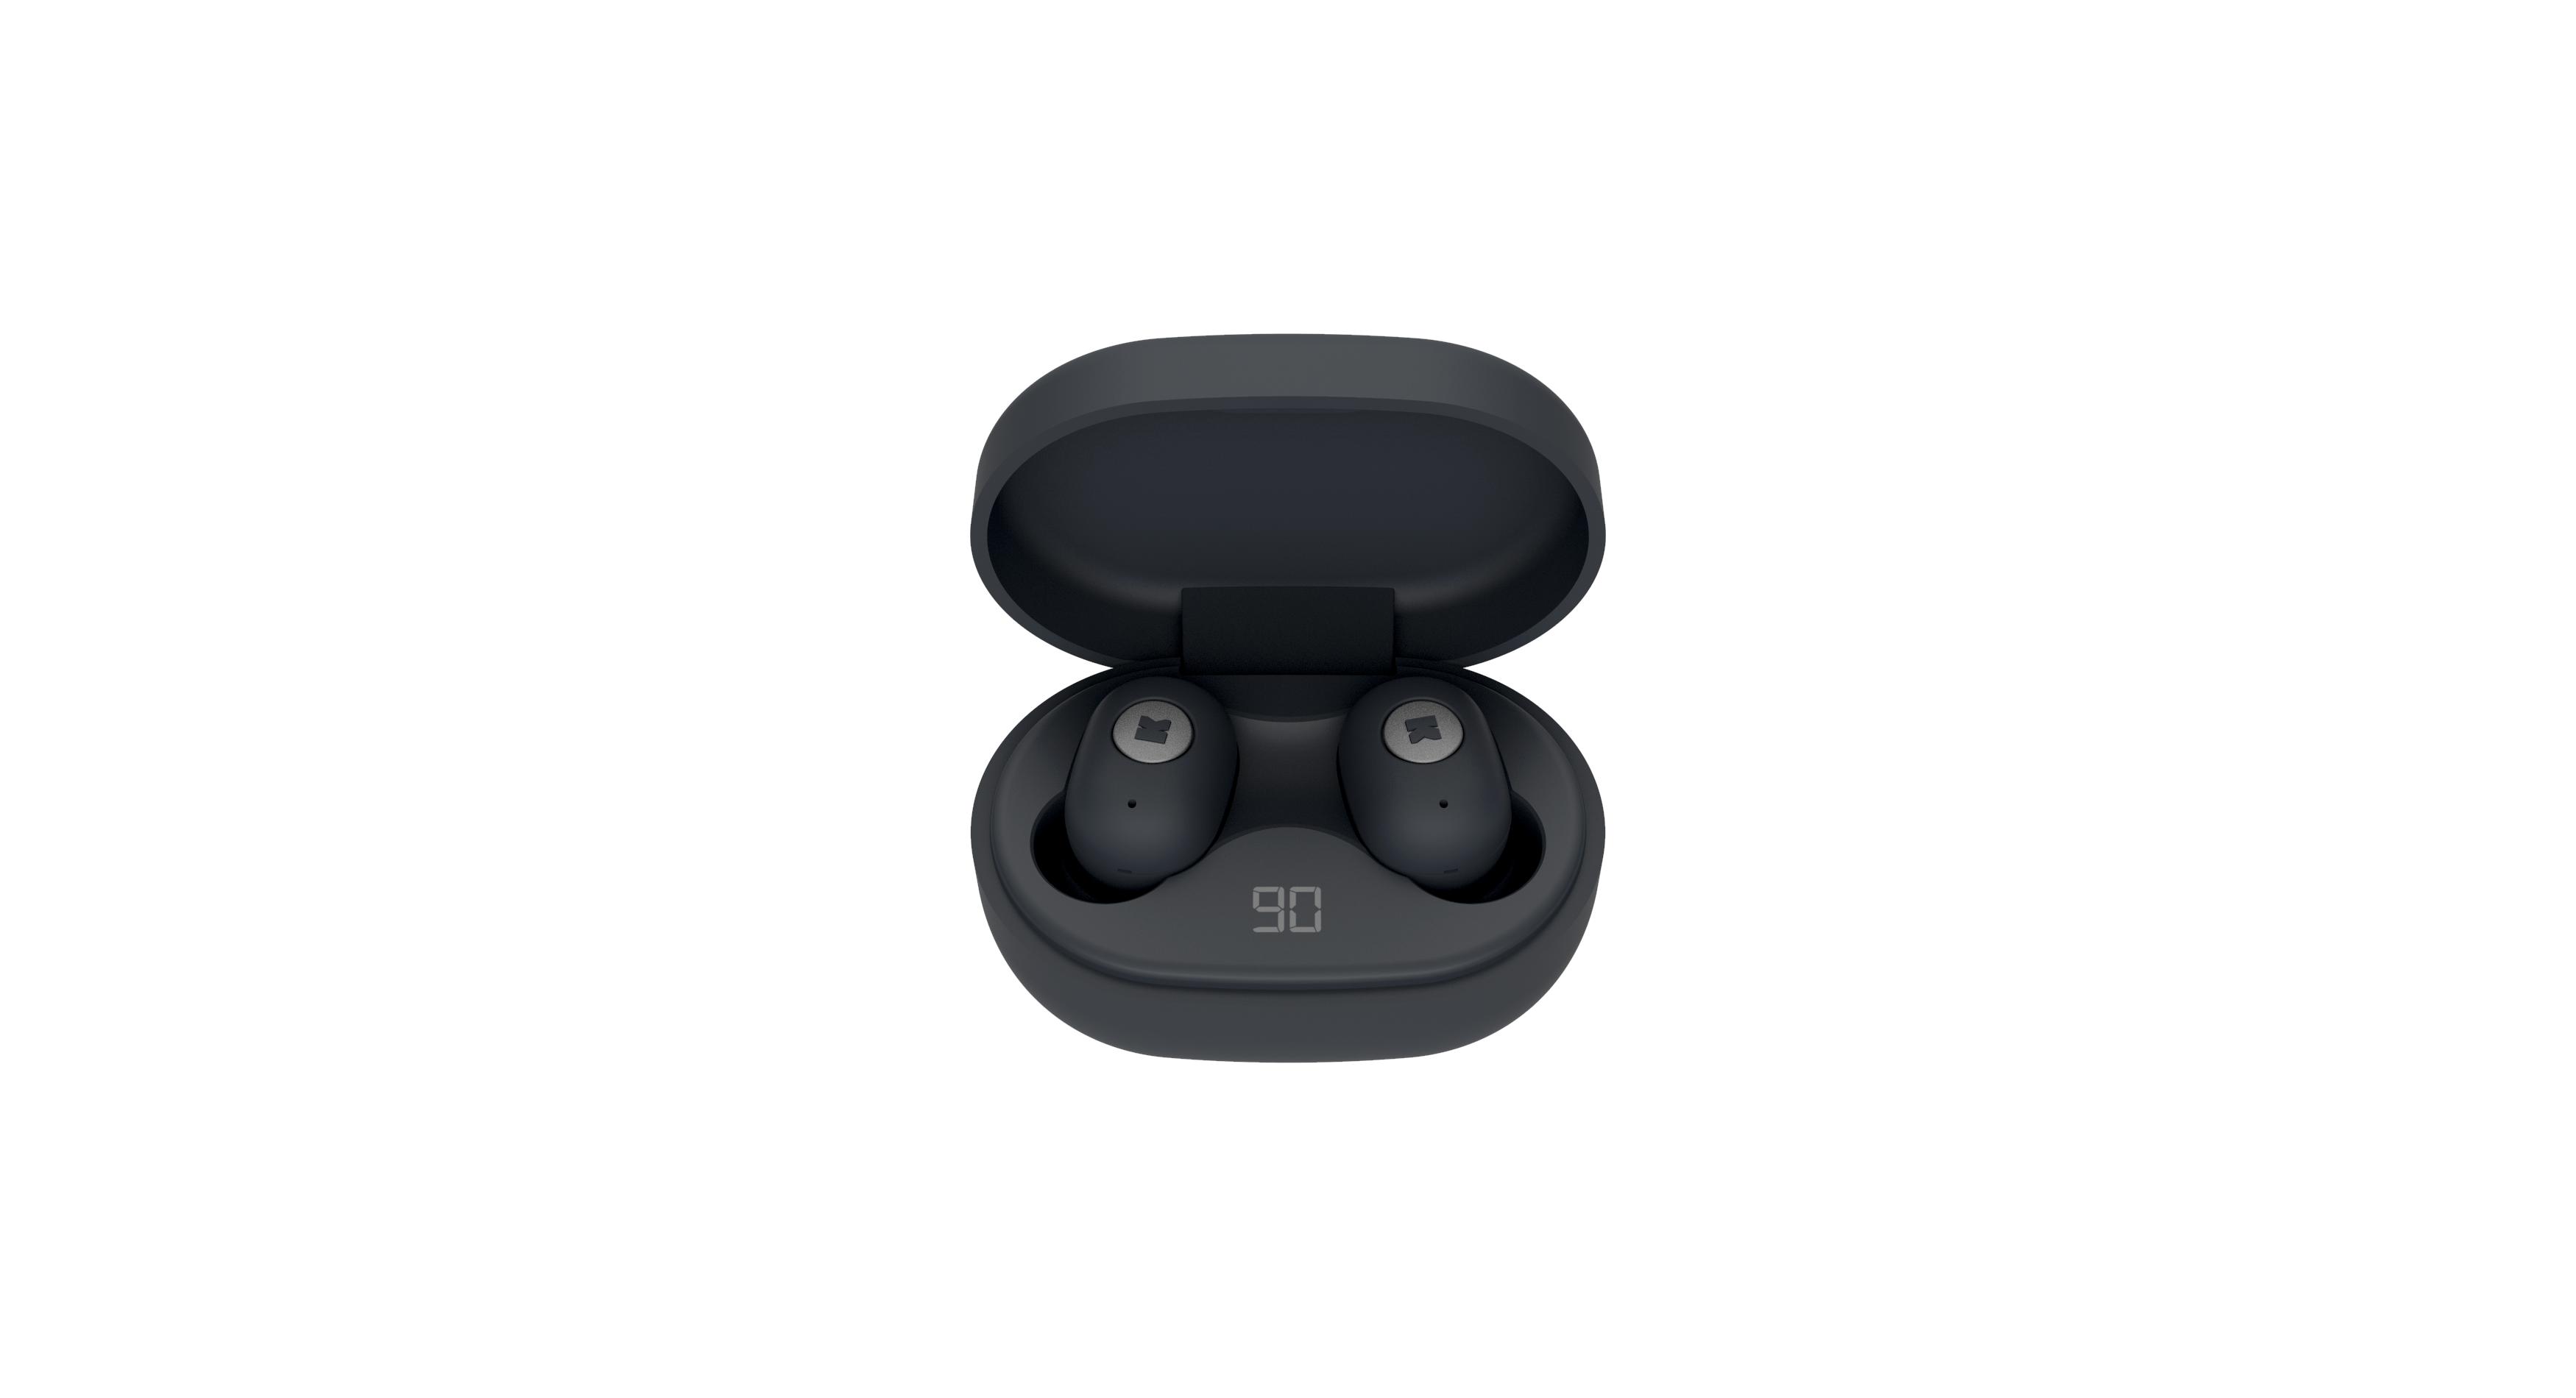 KreaFunk - aBEAN In-Ear Bluetooth Headphones - Black Edition (KFLP10)